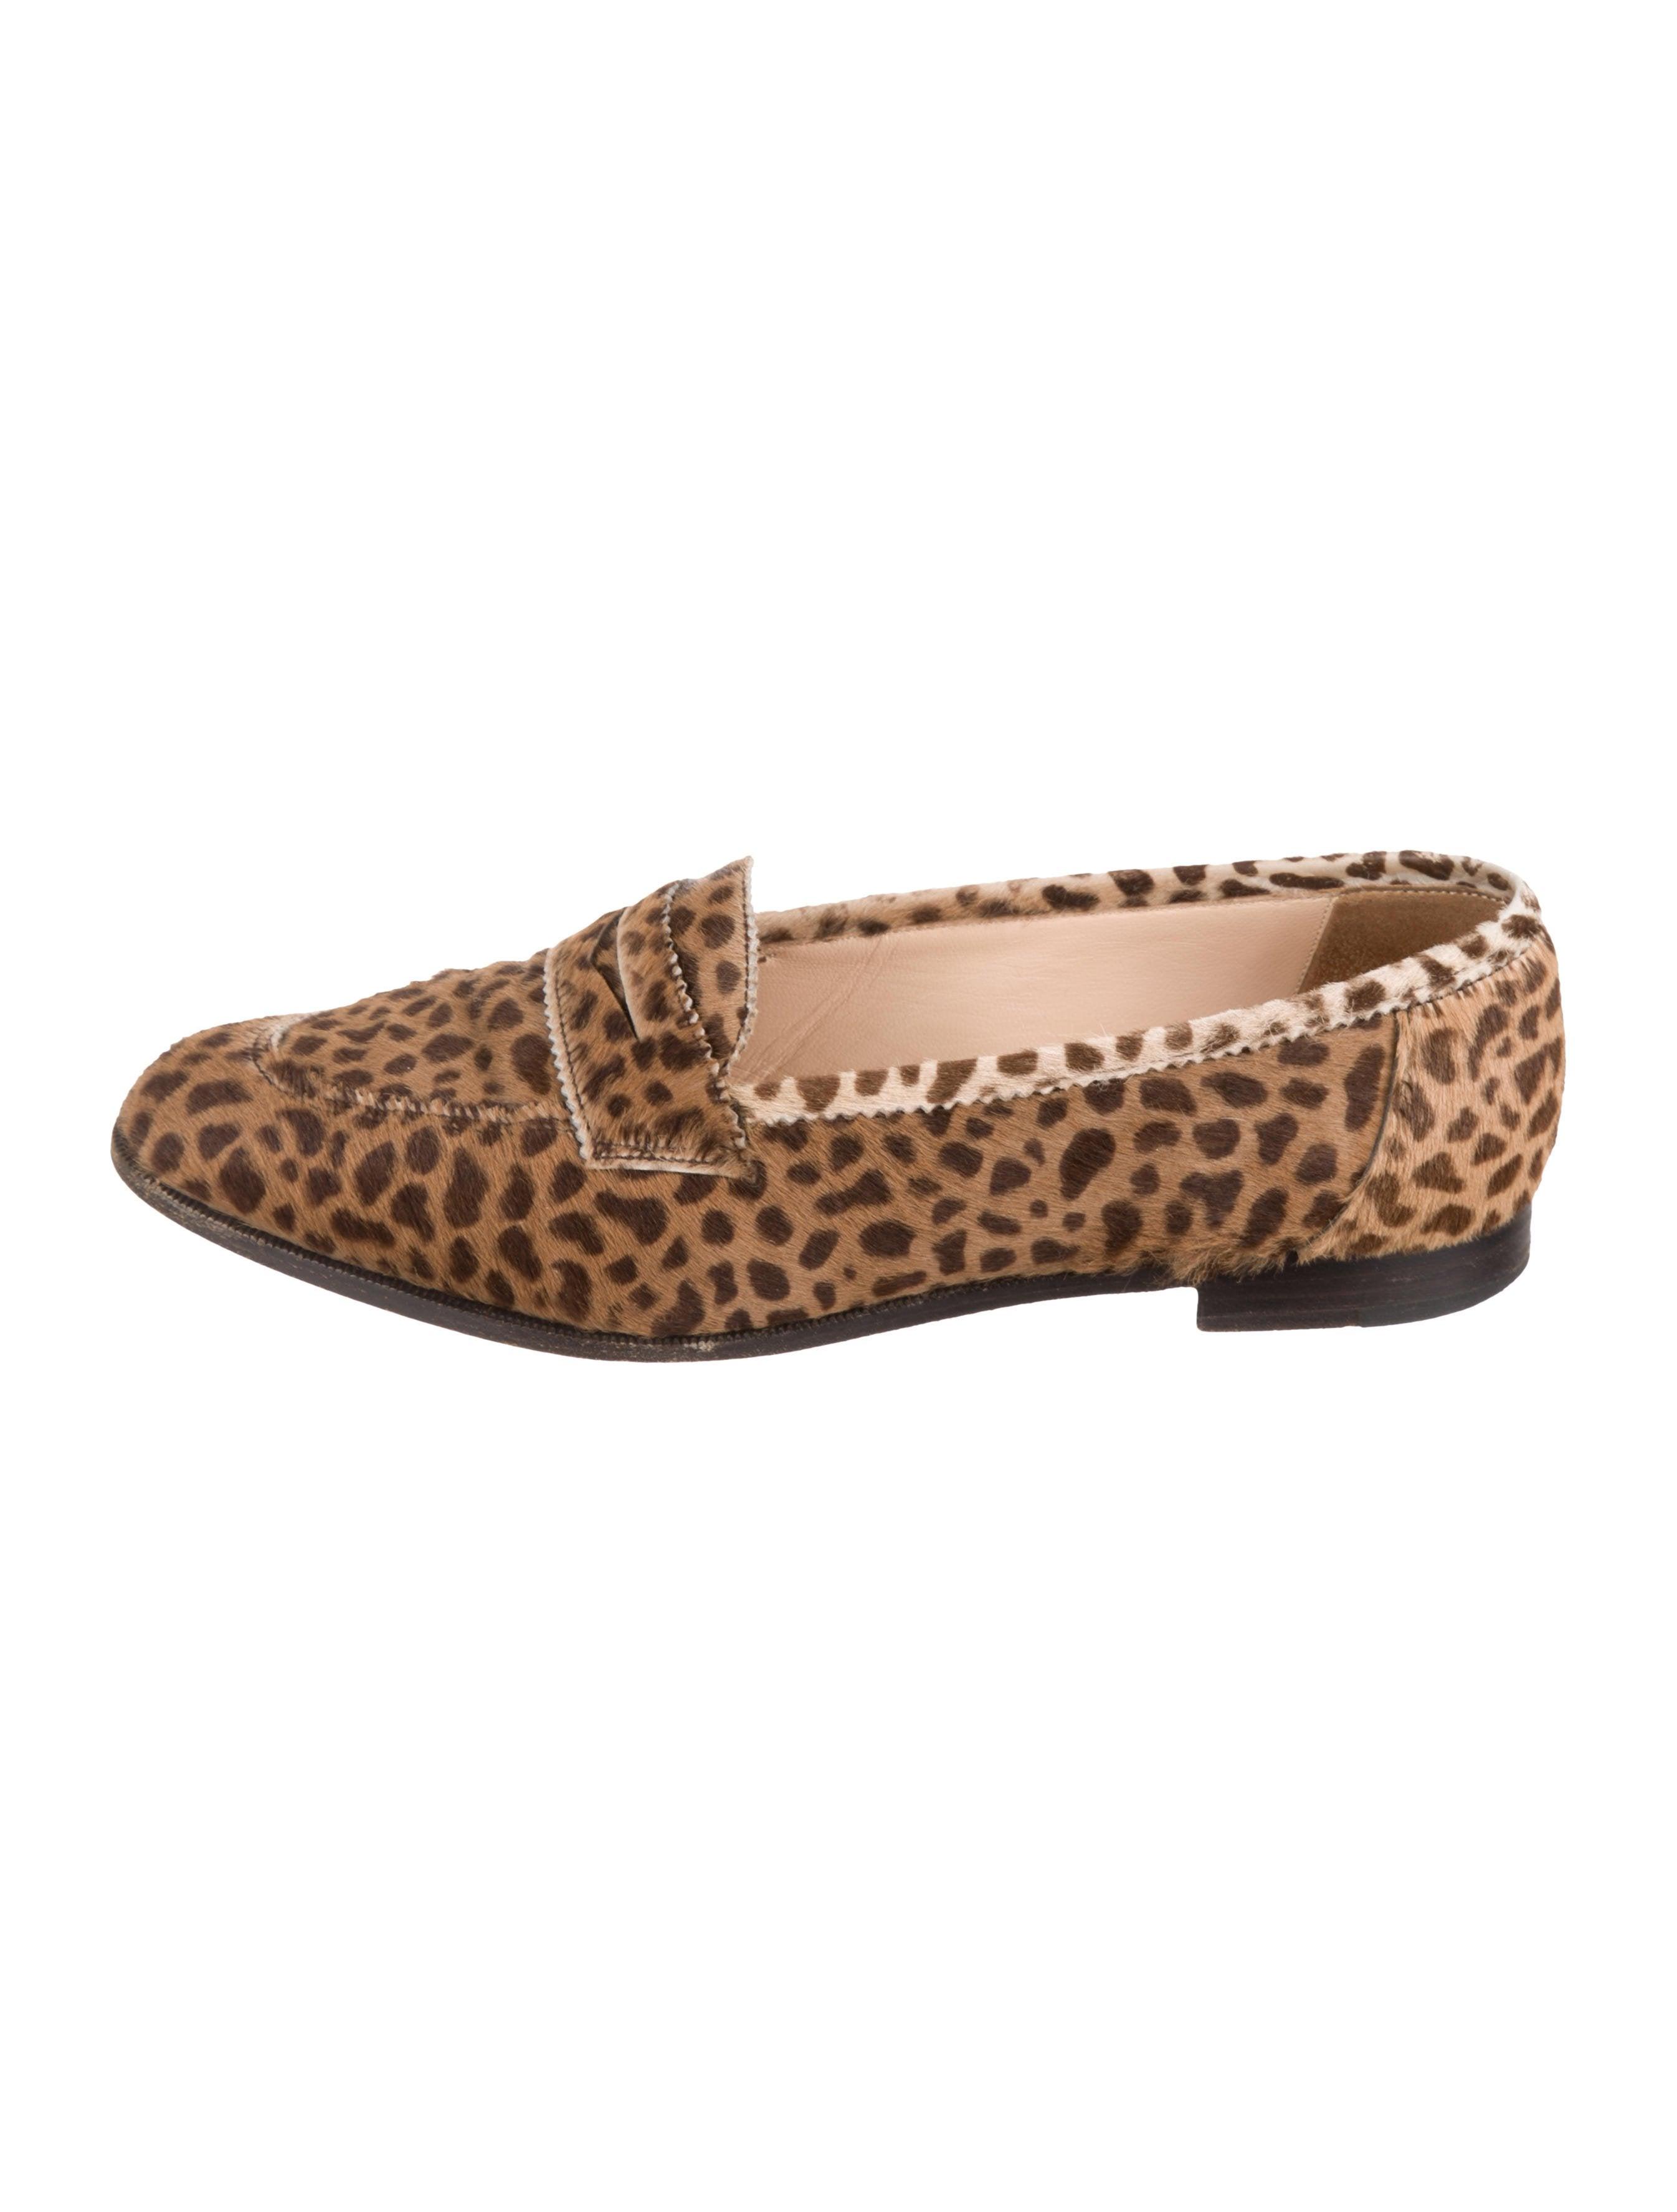 d2cfb6c3ef2d Manolo Blahnik Ponyhair Leopard Print Loafers - Shoes - MOO100815 ...